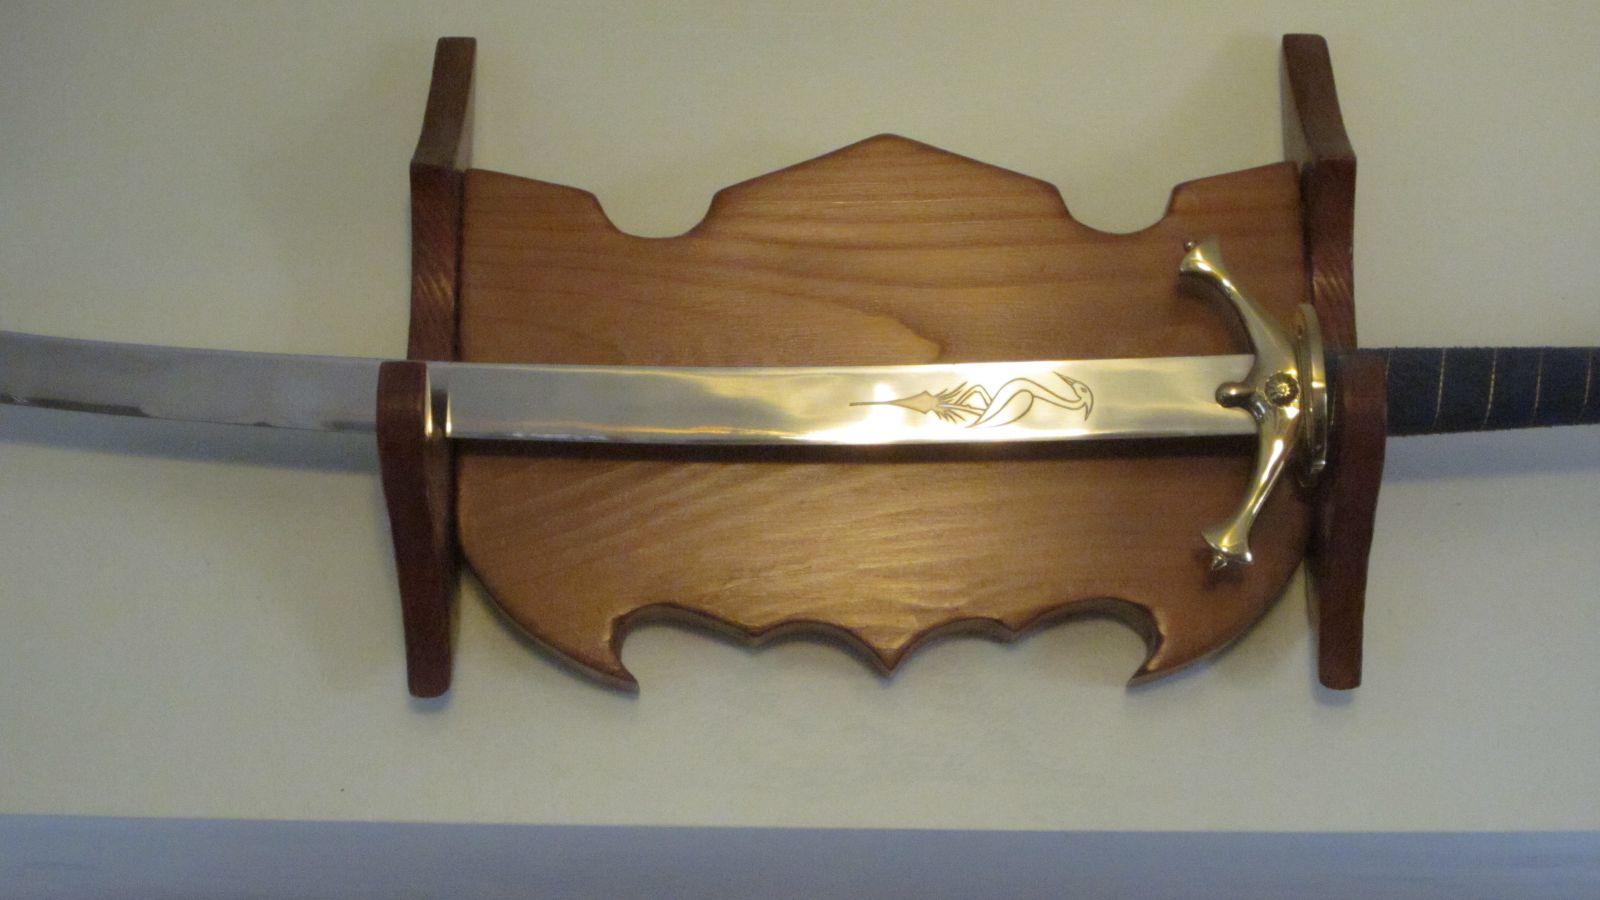 Heron Mark Sword wall hanger